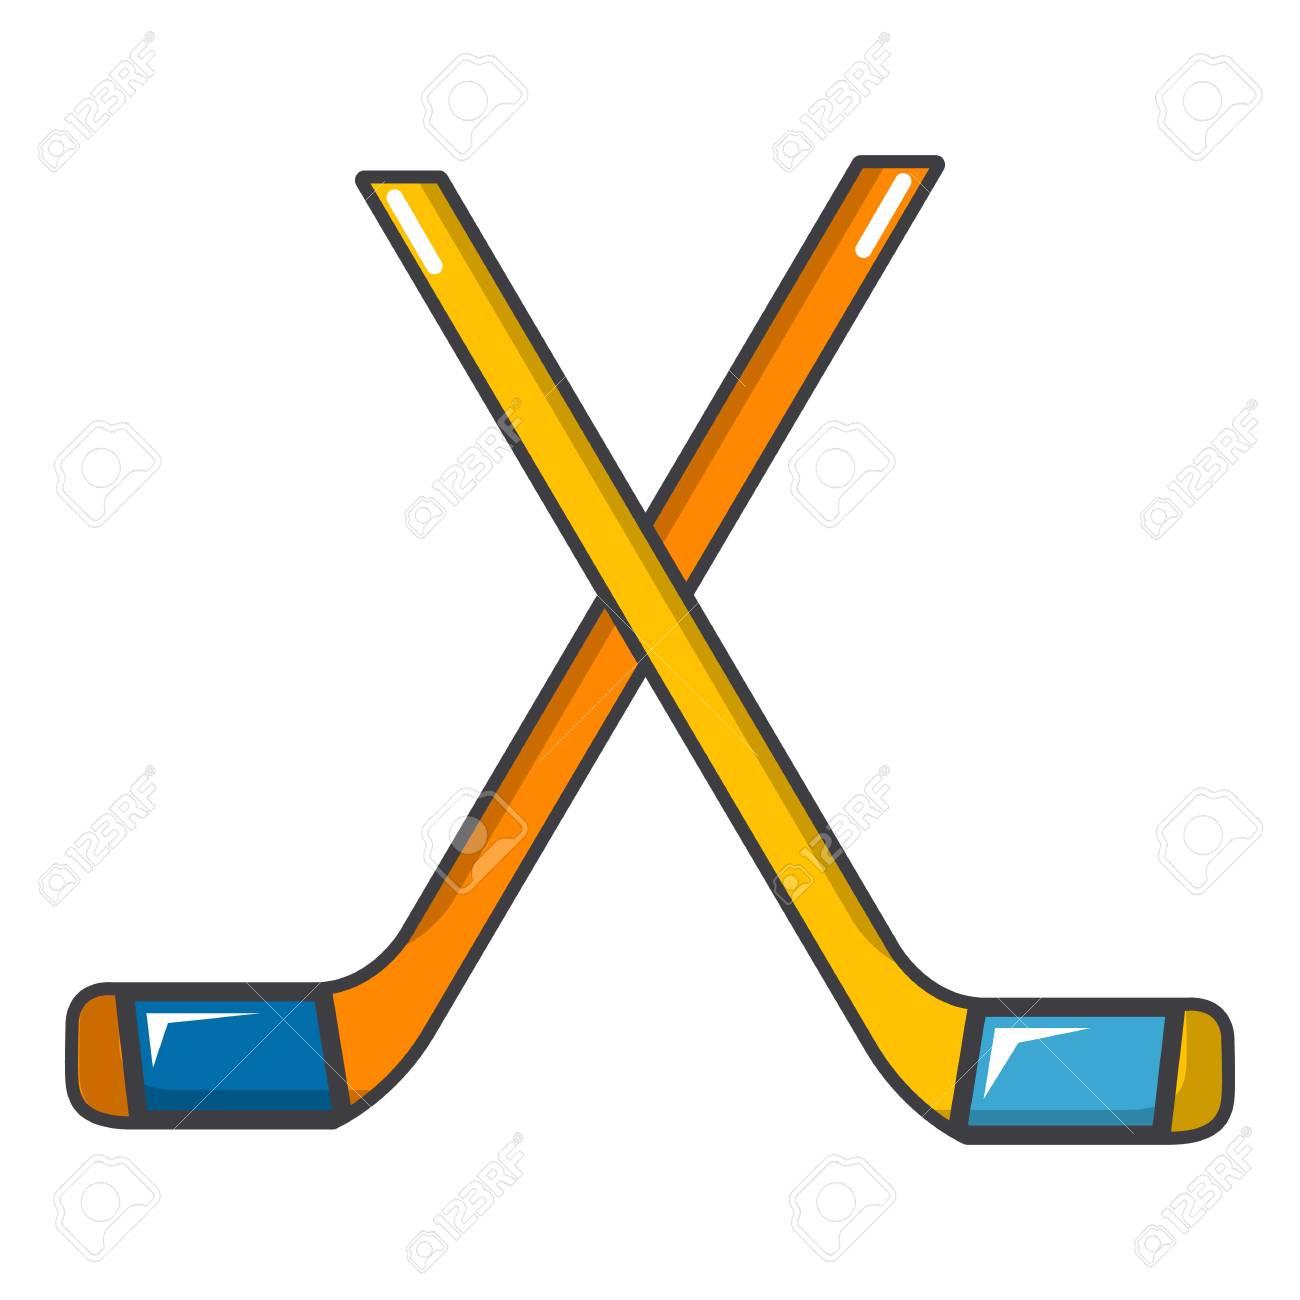 ice hockey sticks icon cartoon illustration of ice hockey sticks rh 123rf com cartoon hockey stick clipart cartoon hockey stick clipart